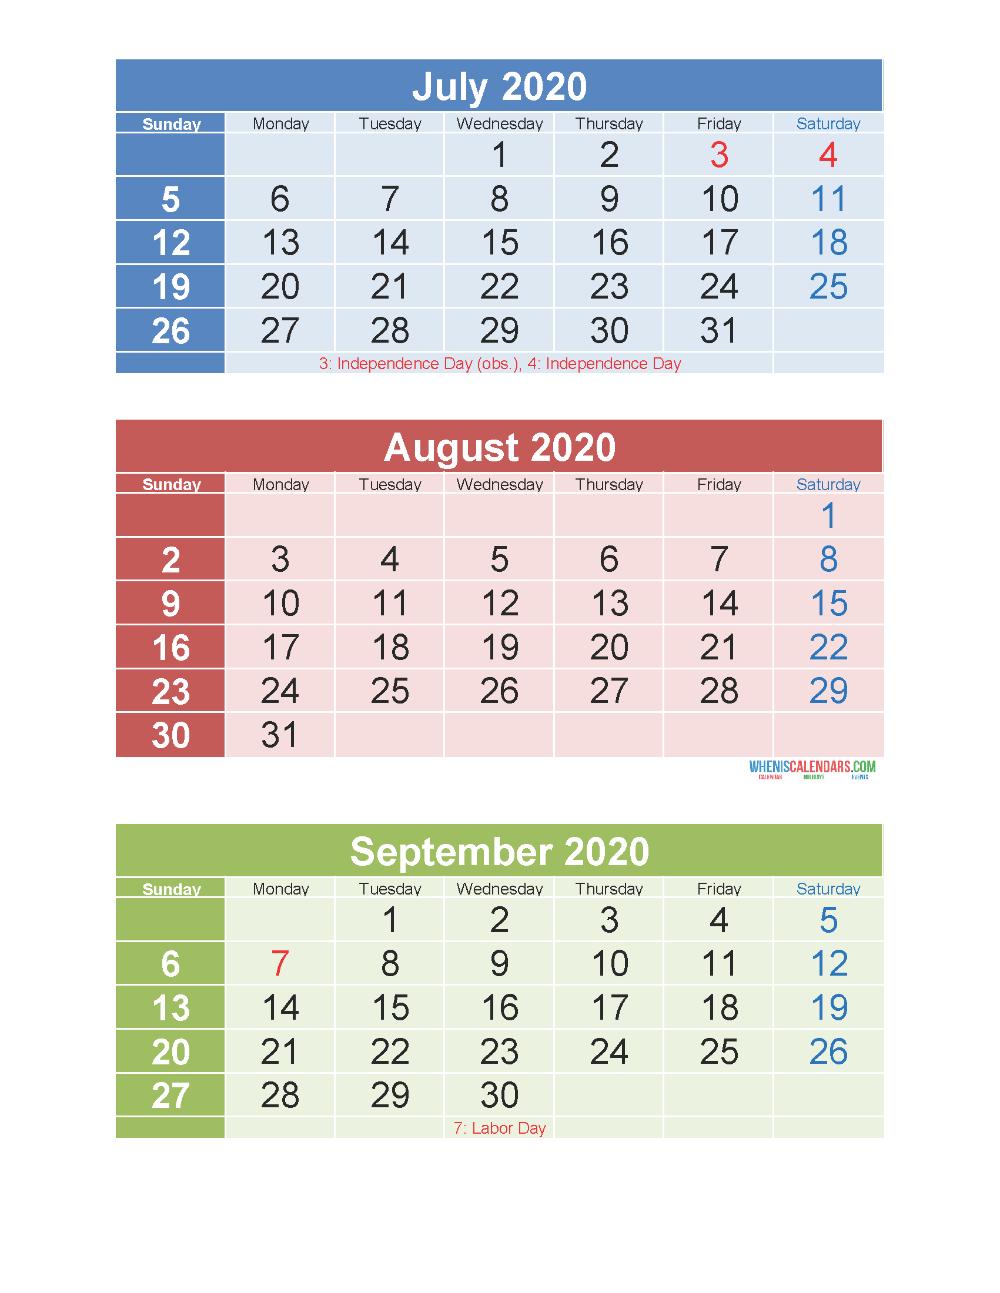 Free Printable 3 Month Calendar 2020 July August September inside 3 Month Printable Calendar 2020